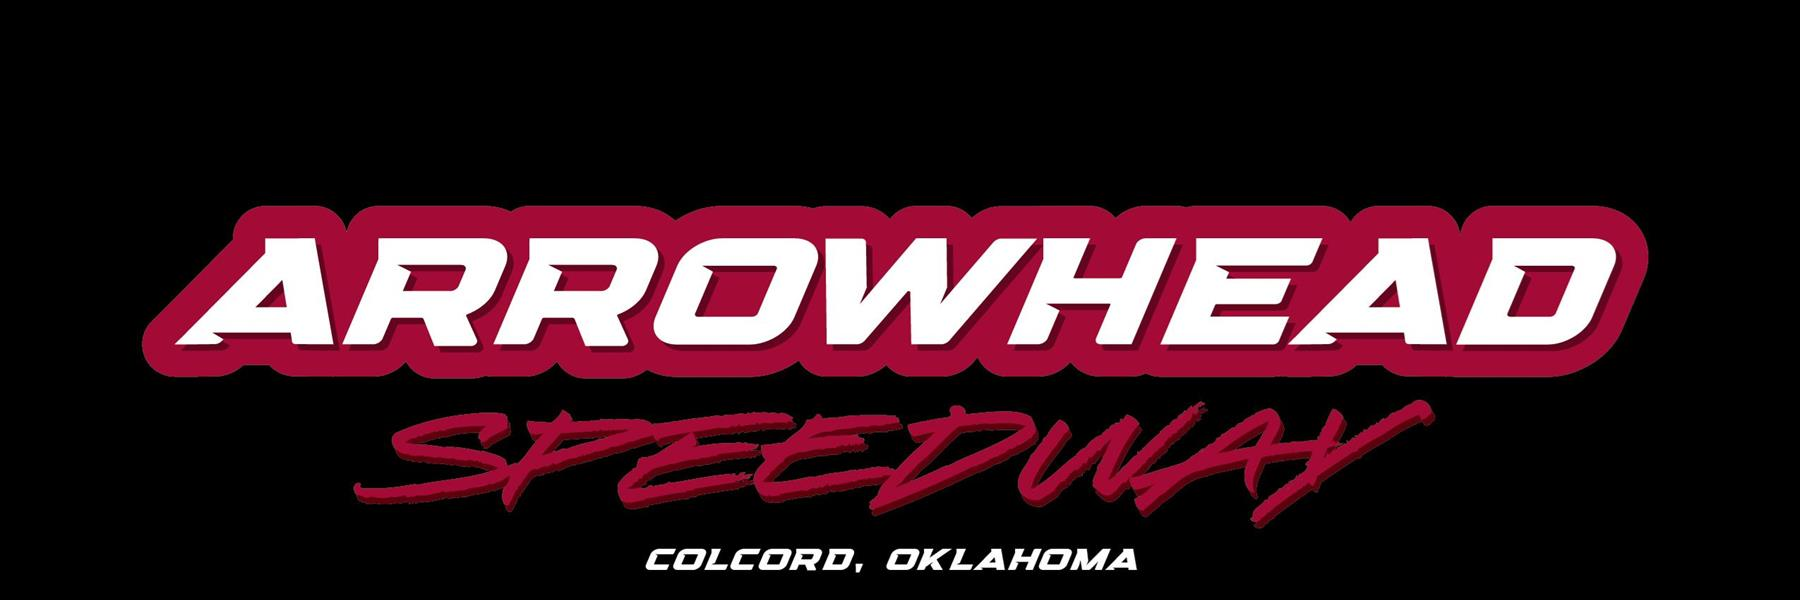 Arrowhead  Speedway